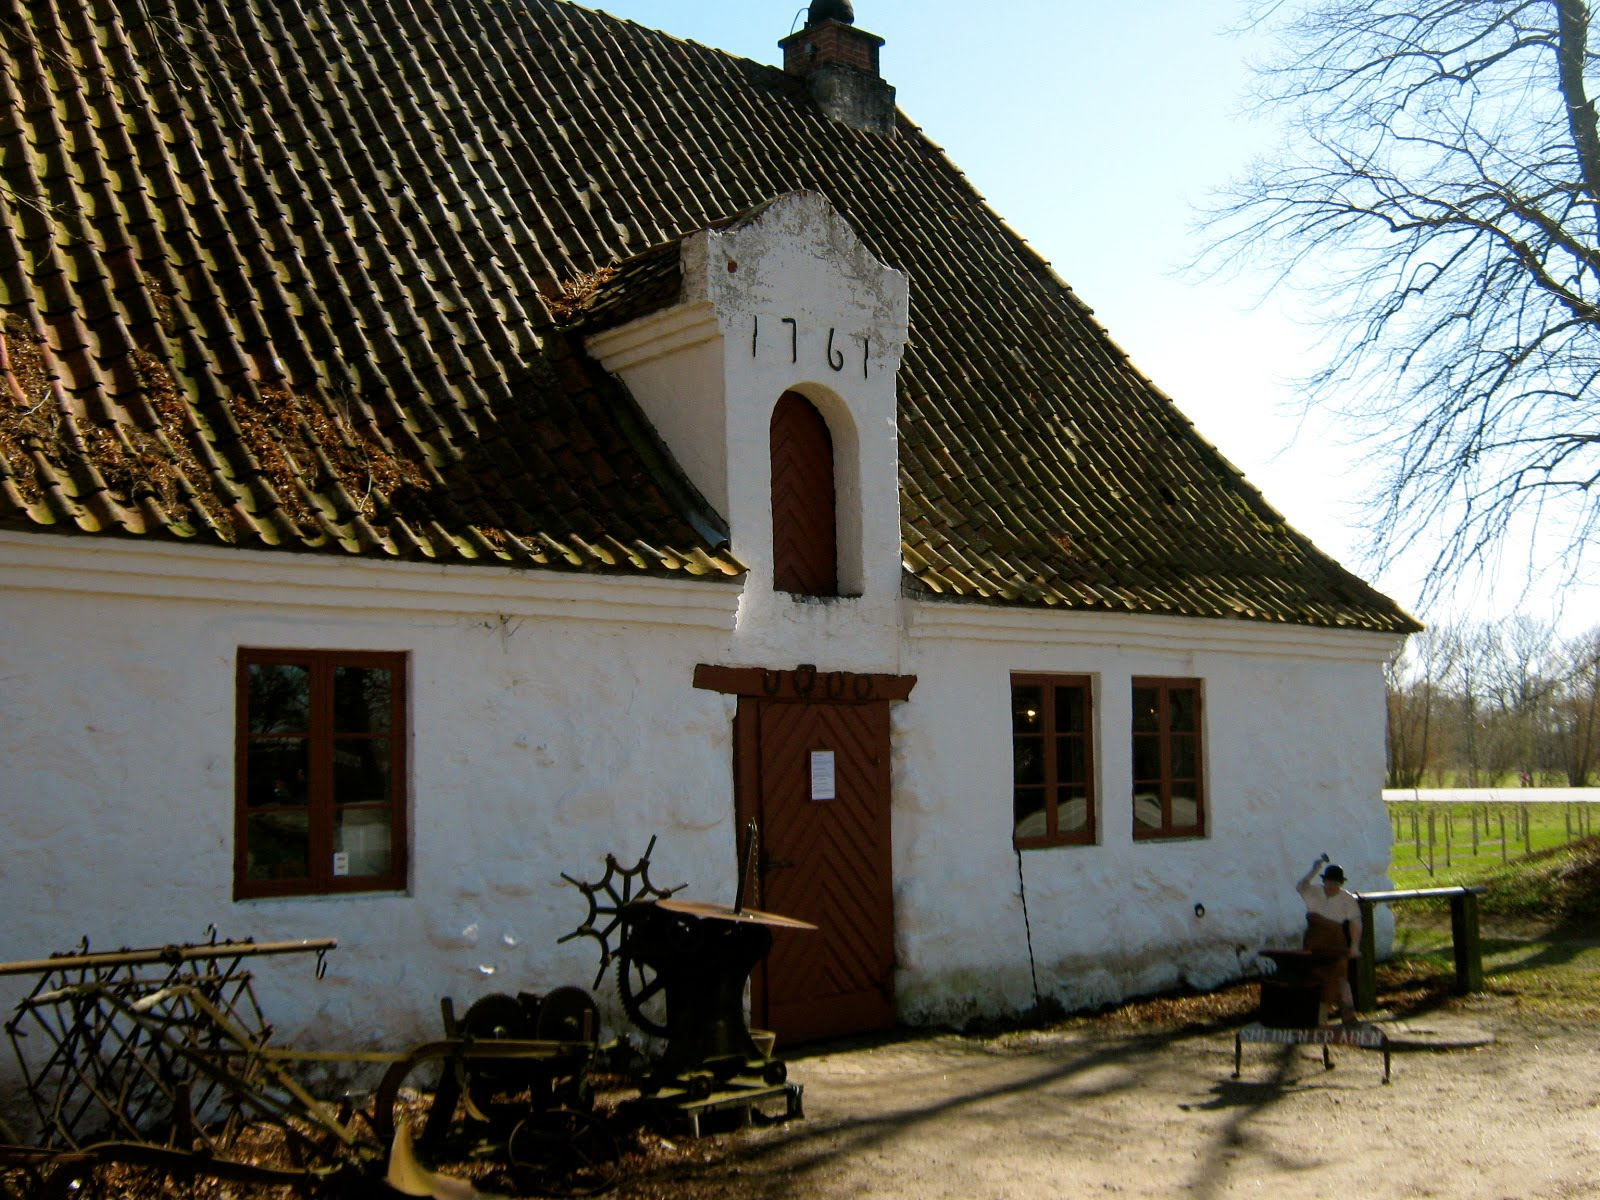 Gammel Estrup agricultural museum escortdk